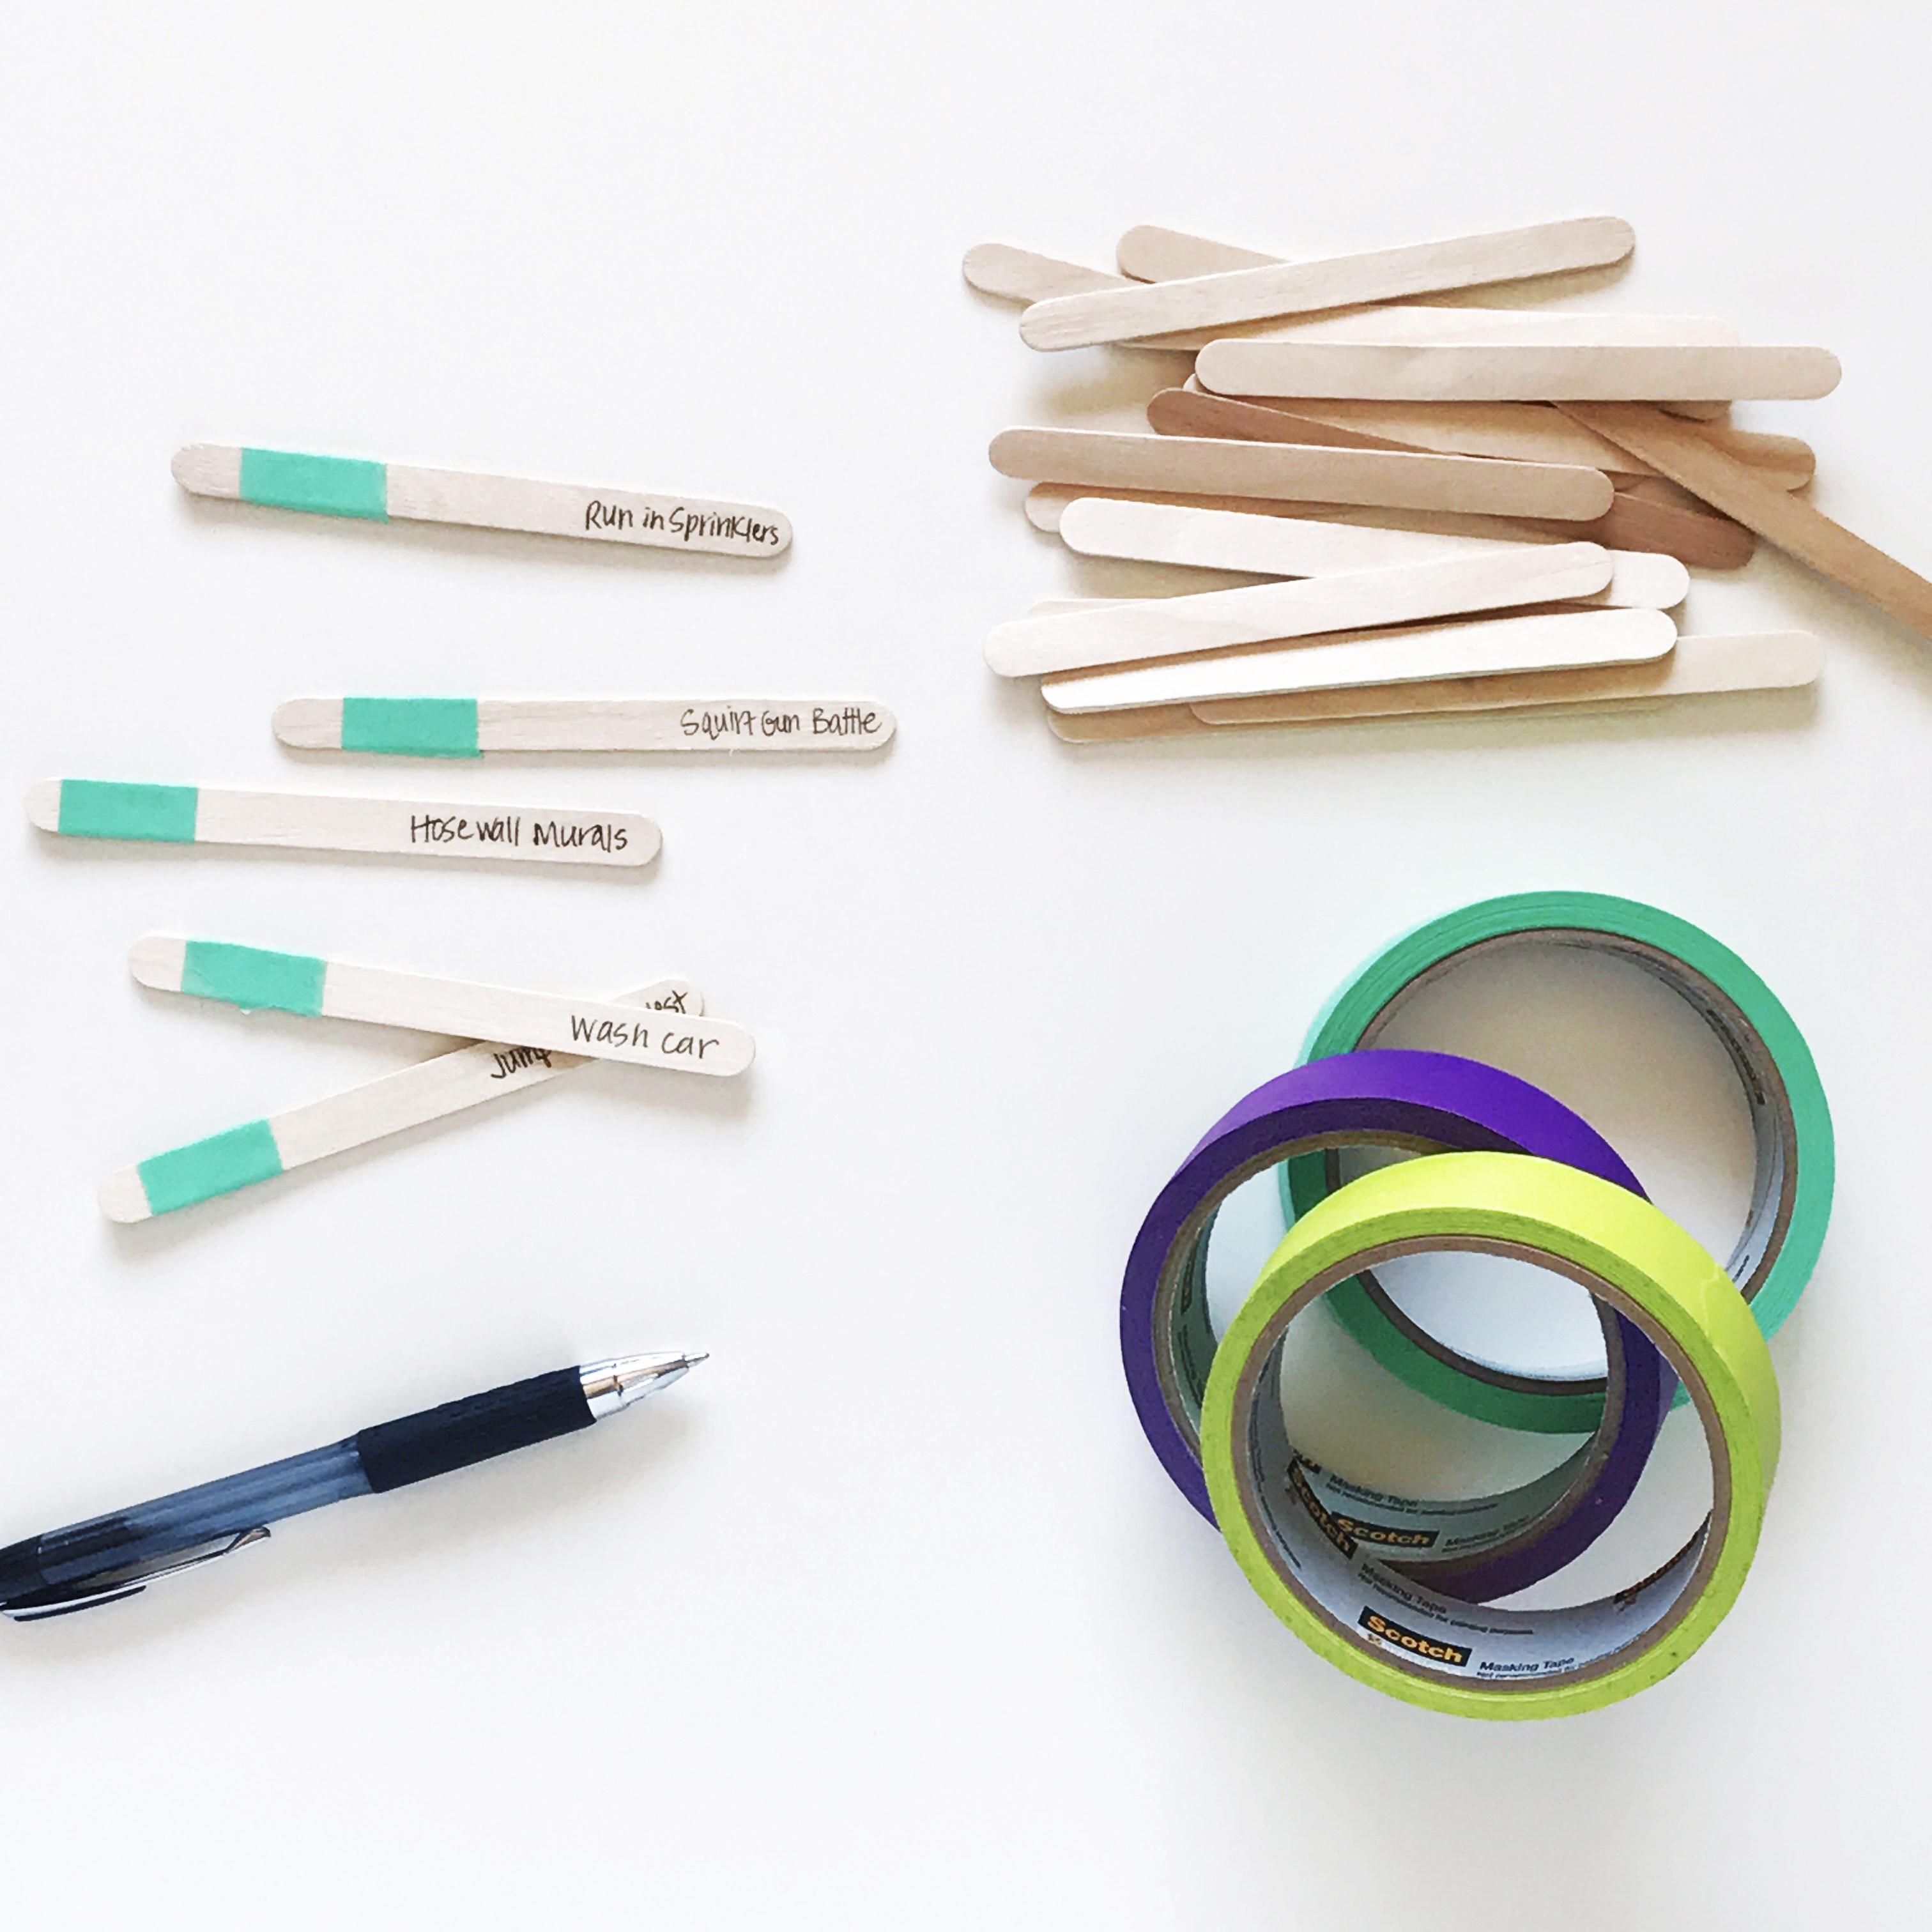 Parent-Free Summer Activity Ideas to beat summer boredom via @PagingSupermom